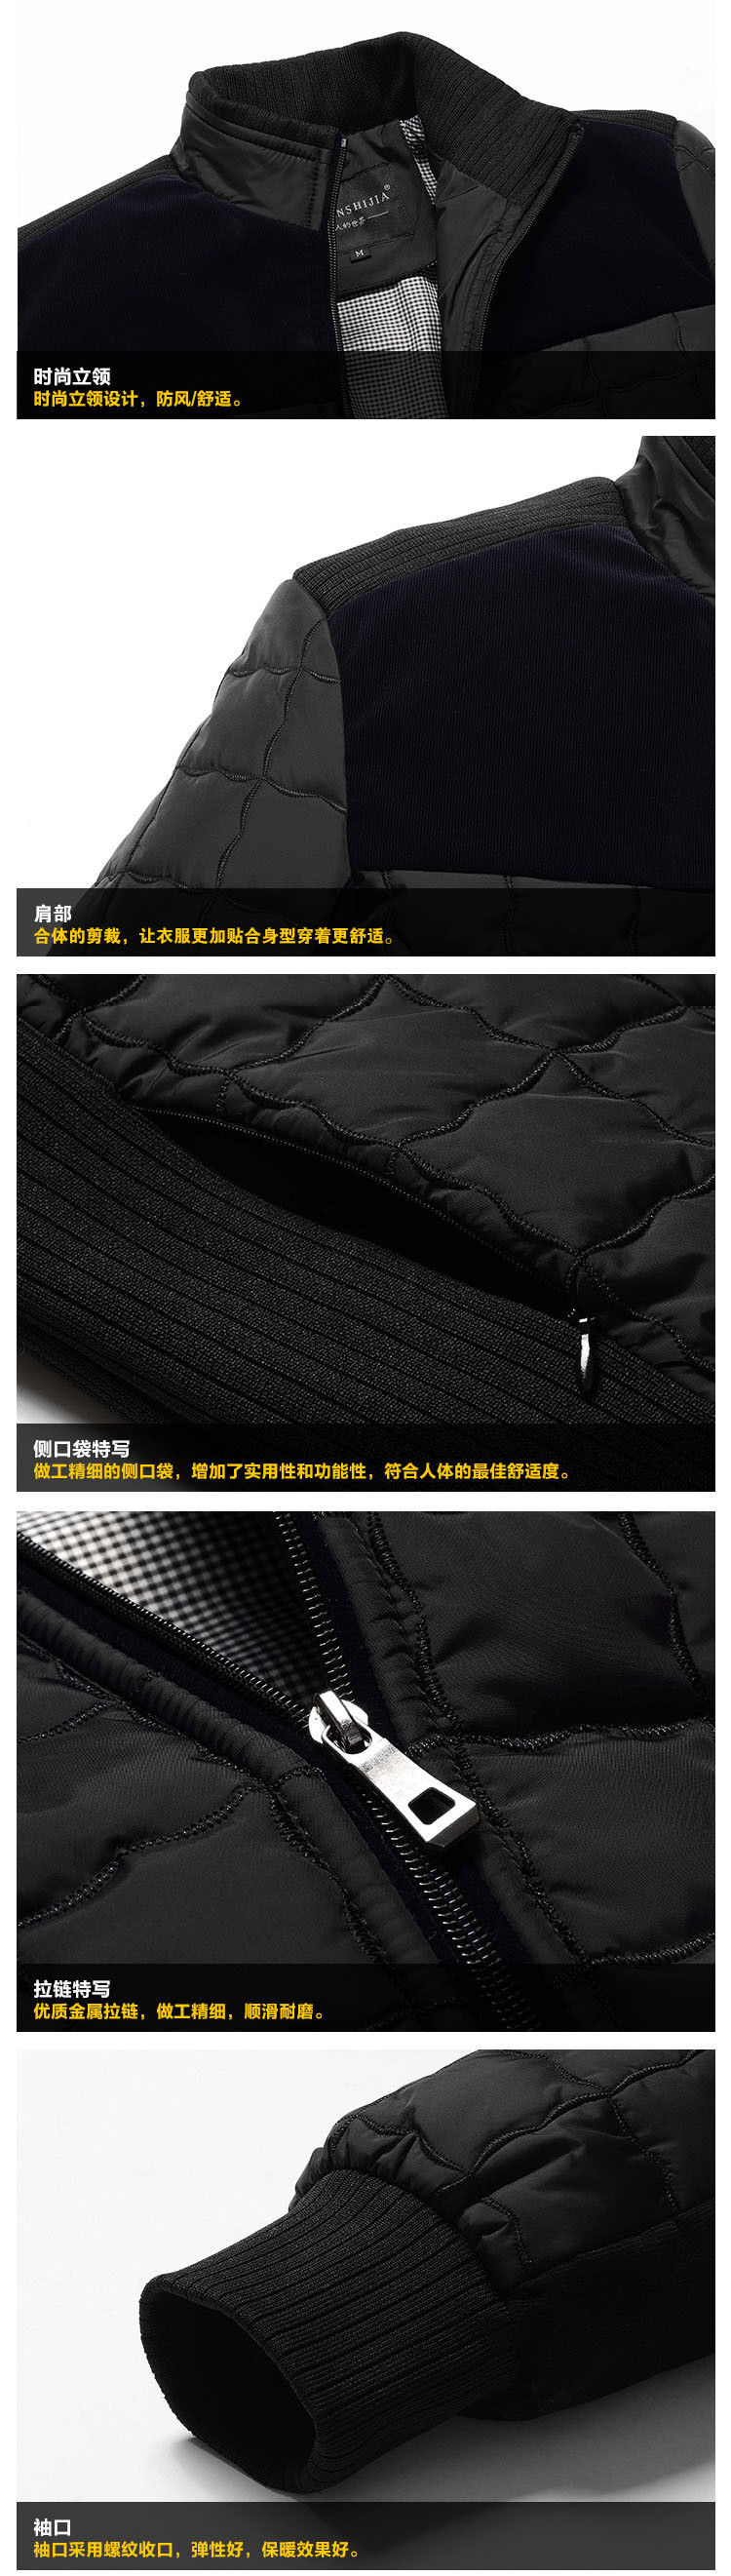 мужчины зима куртка верхняя одежда свободного покроя спортивная одежда одежда спорт куртка мужчины большой размер М-3XL j429